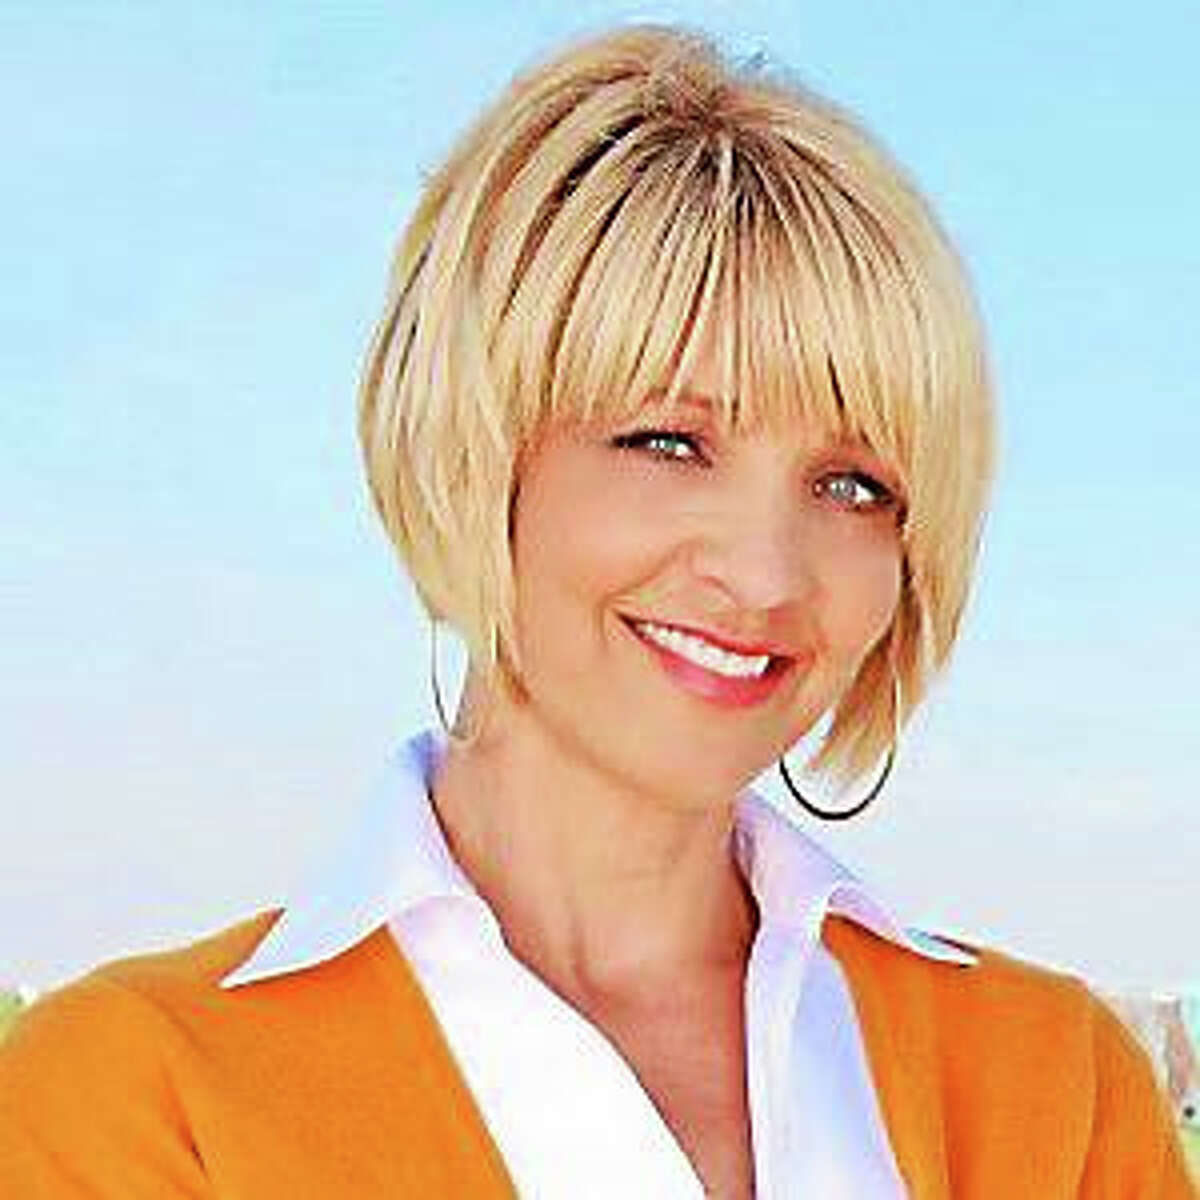 WTNH-TV anchor, reporter Ann Nyberg